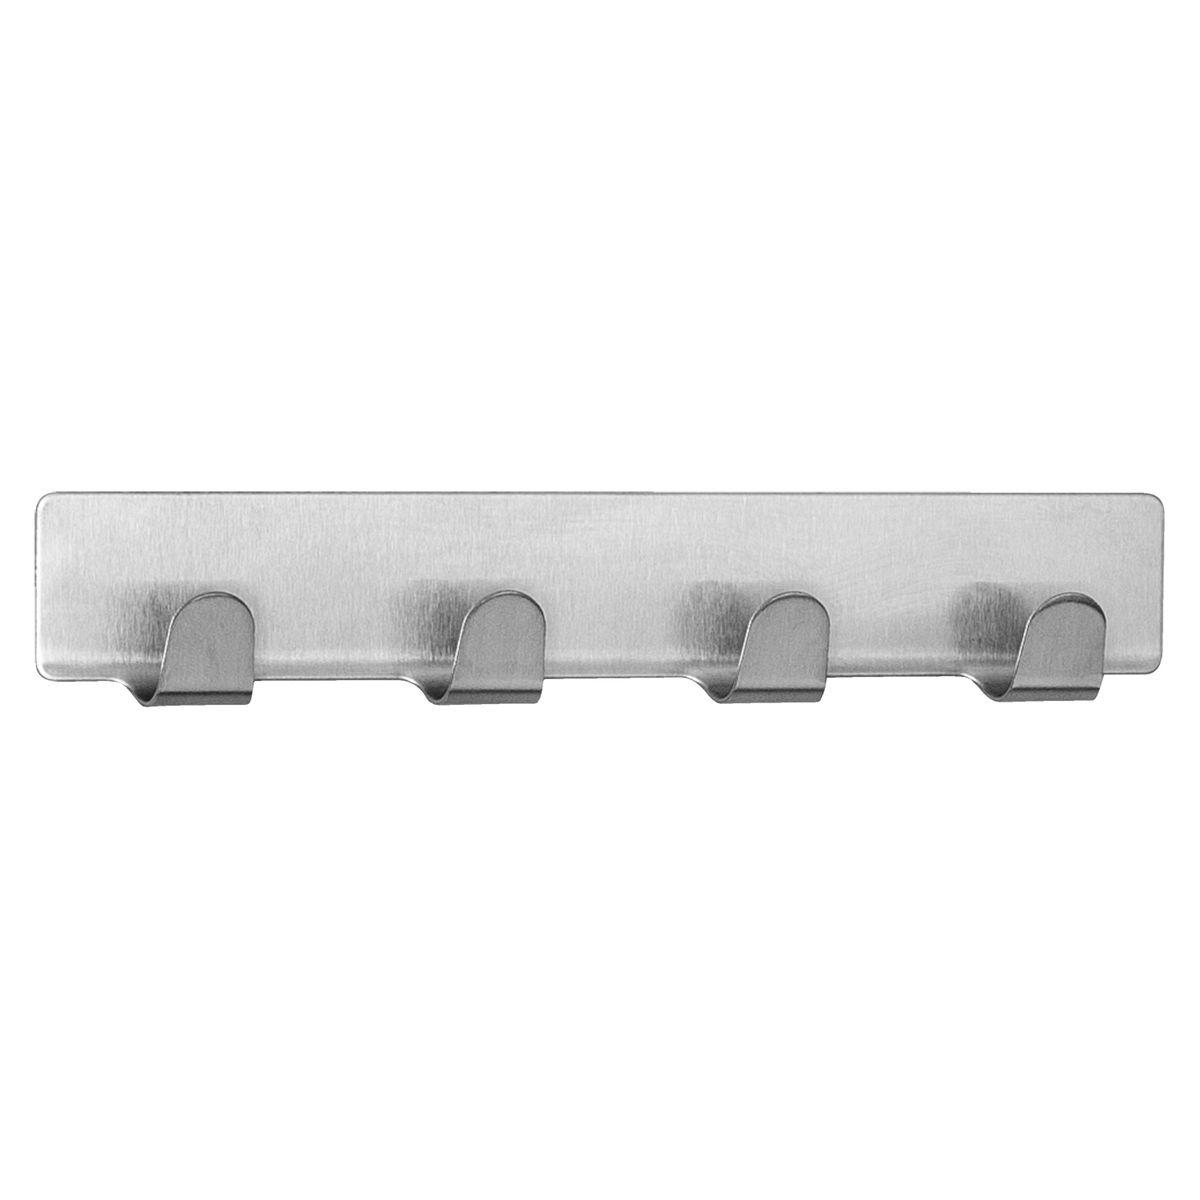 Самоклеящаяся планка Tatkraft Fyra, с четырьмя крючками, 16 х 2,5 см tatkraft mega lock